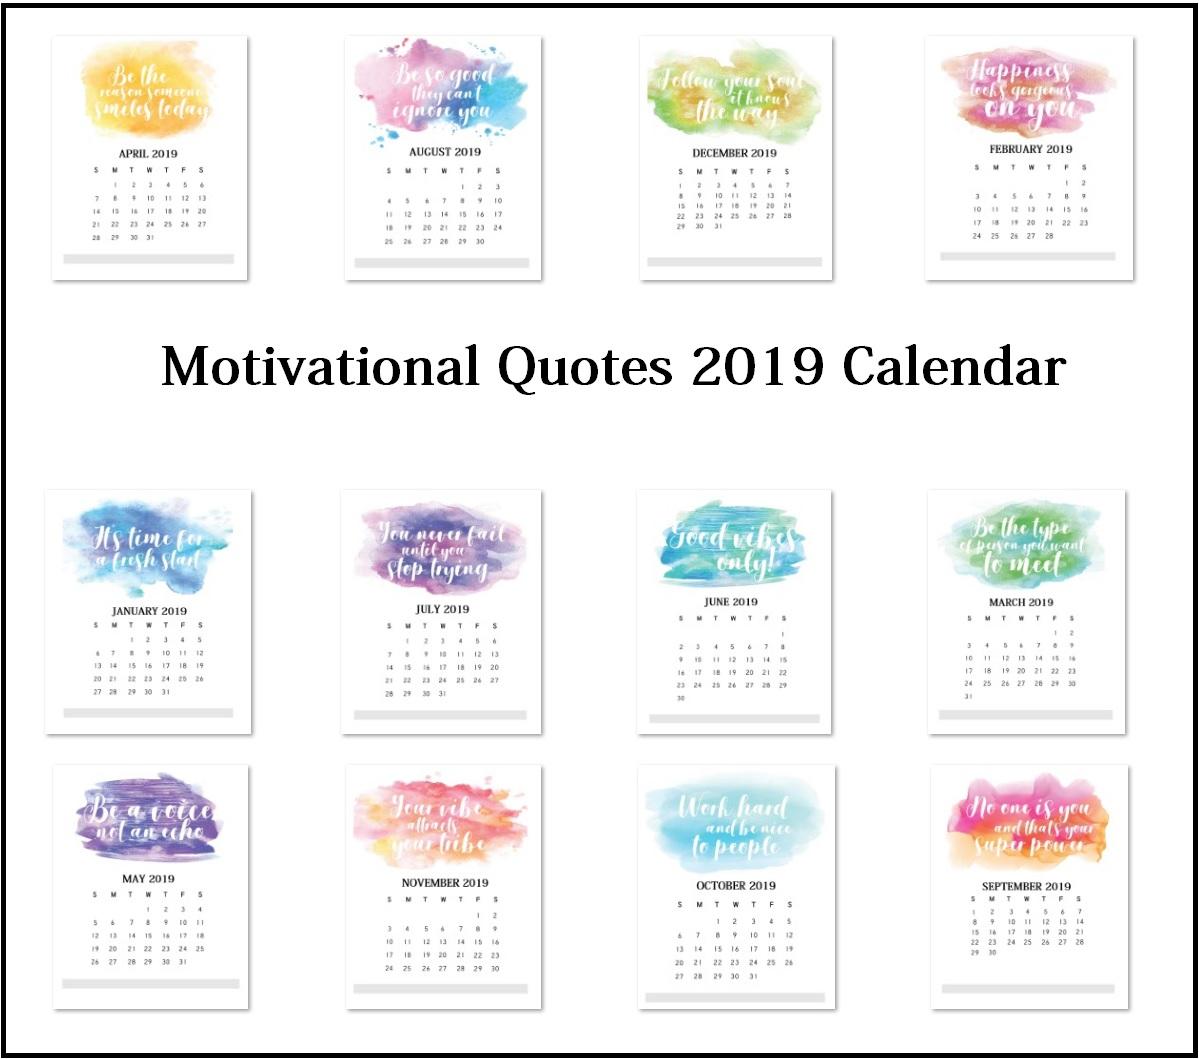 Motivational Quotes 2019 Calendar